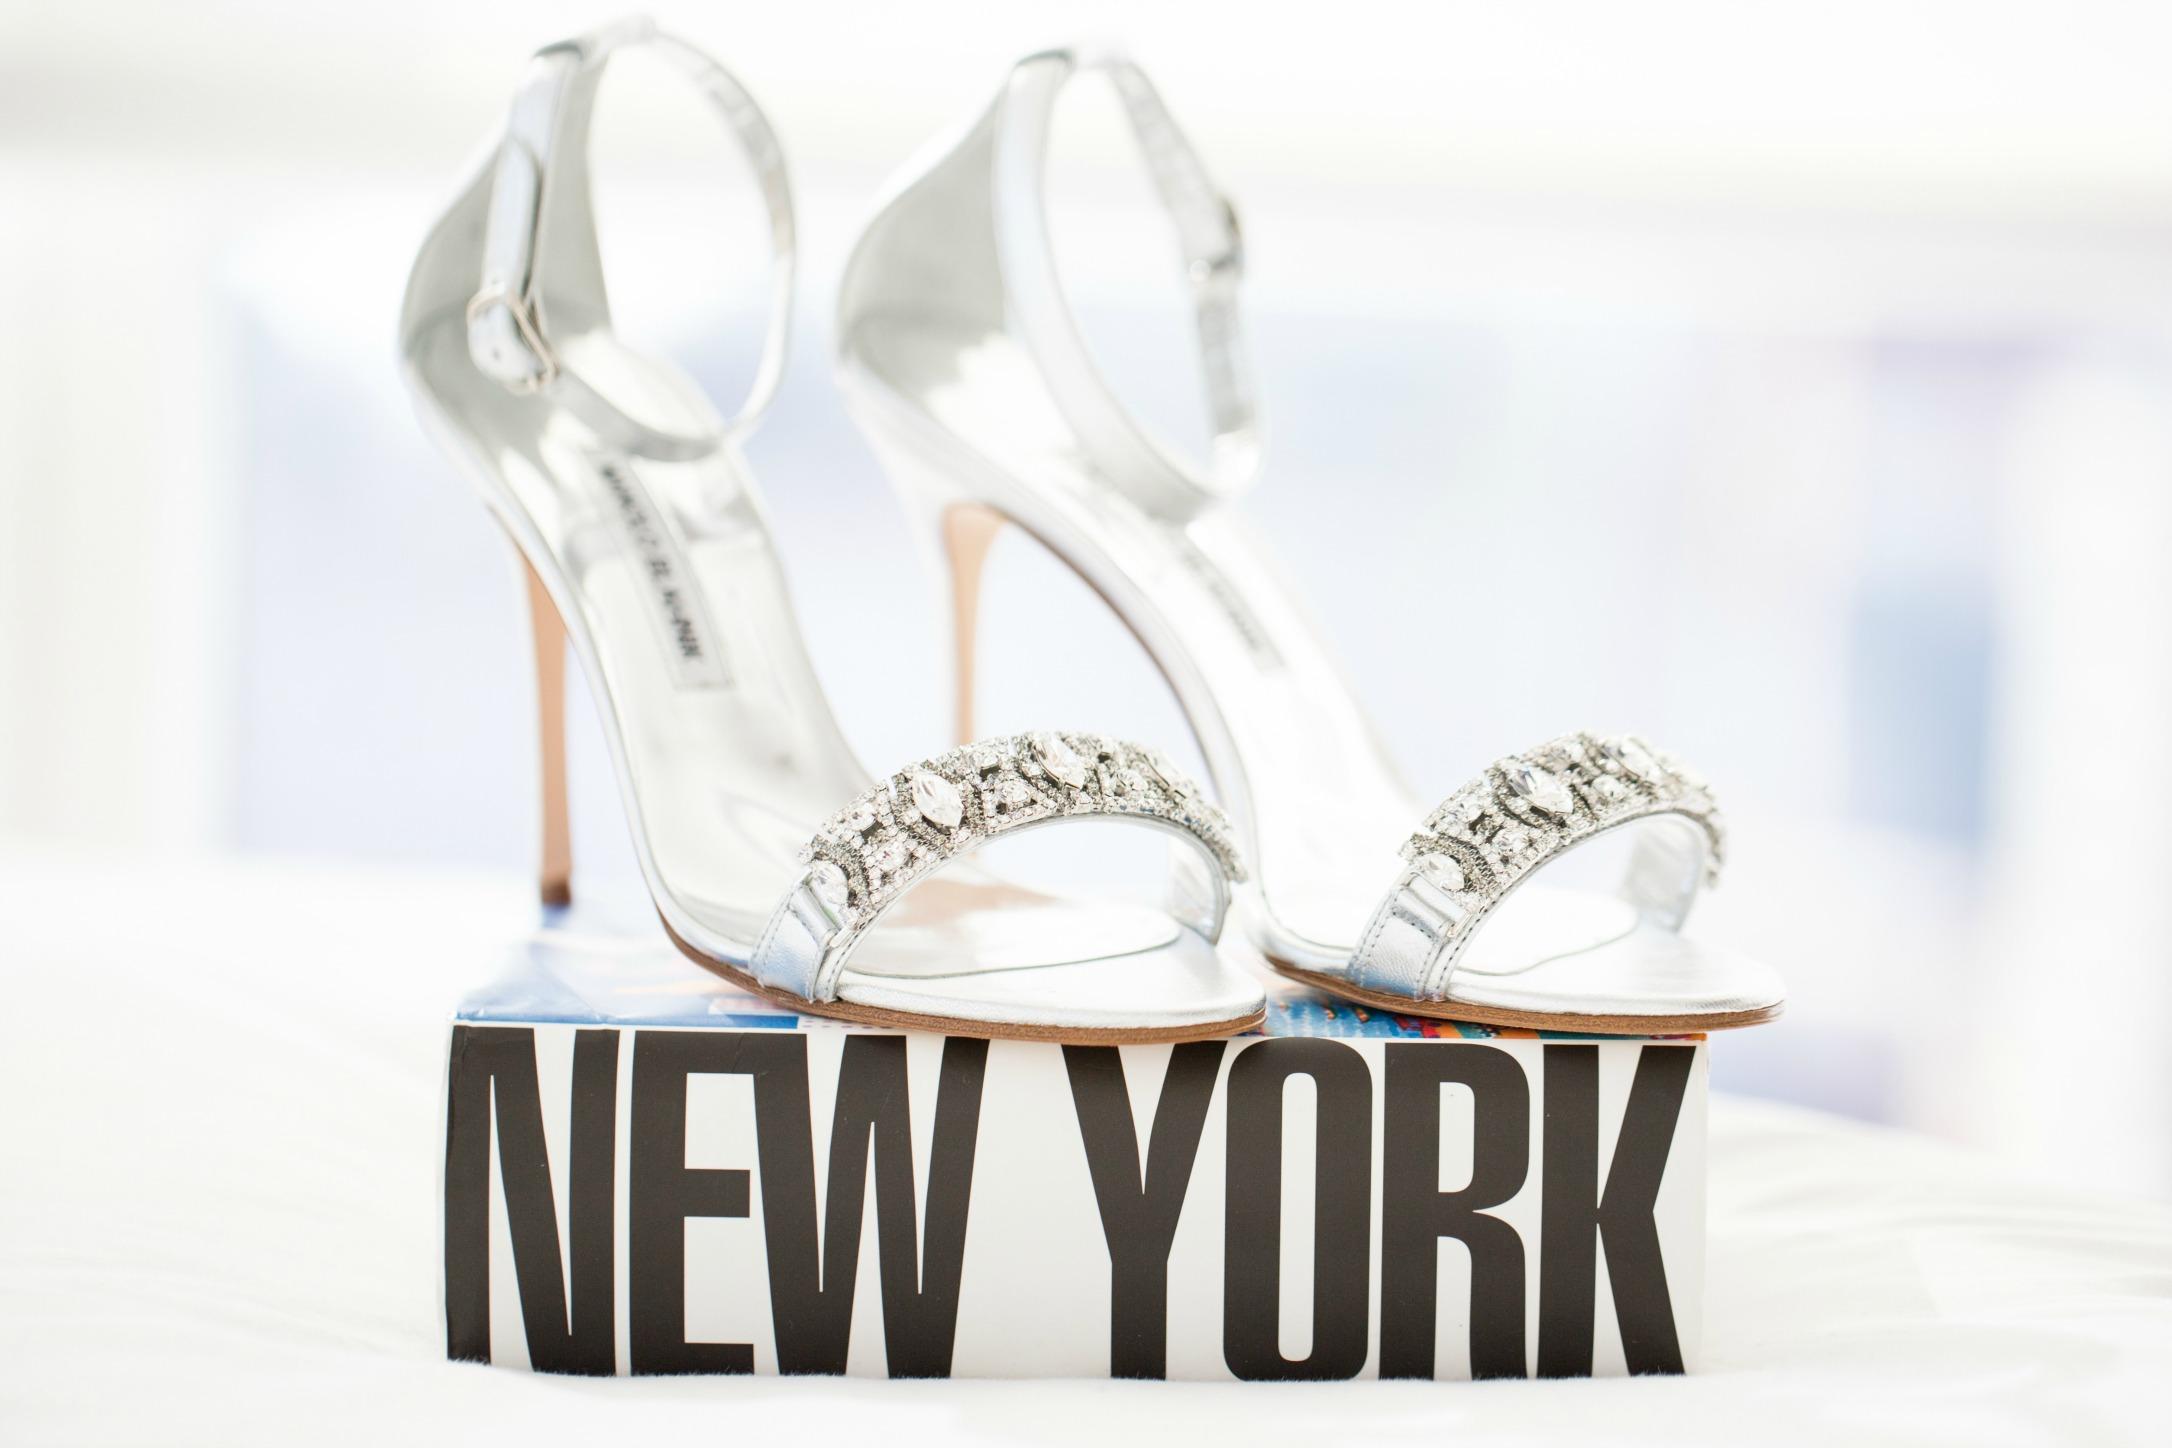 NYC Chic Winter Wedding ǀ Dee Kay Events ǀ Wedding Consultant ǀ Wedding Design